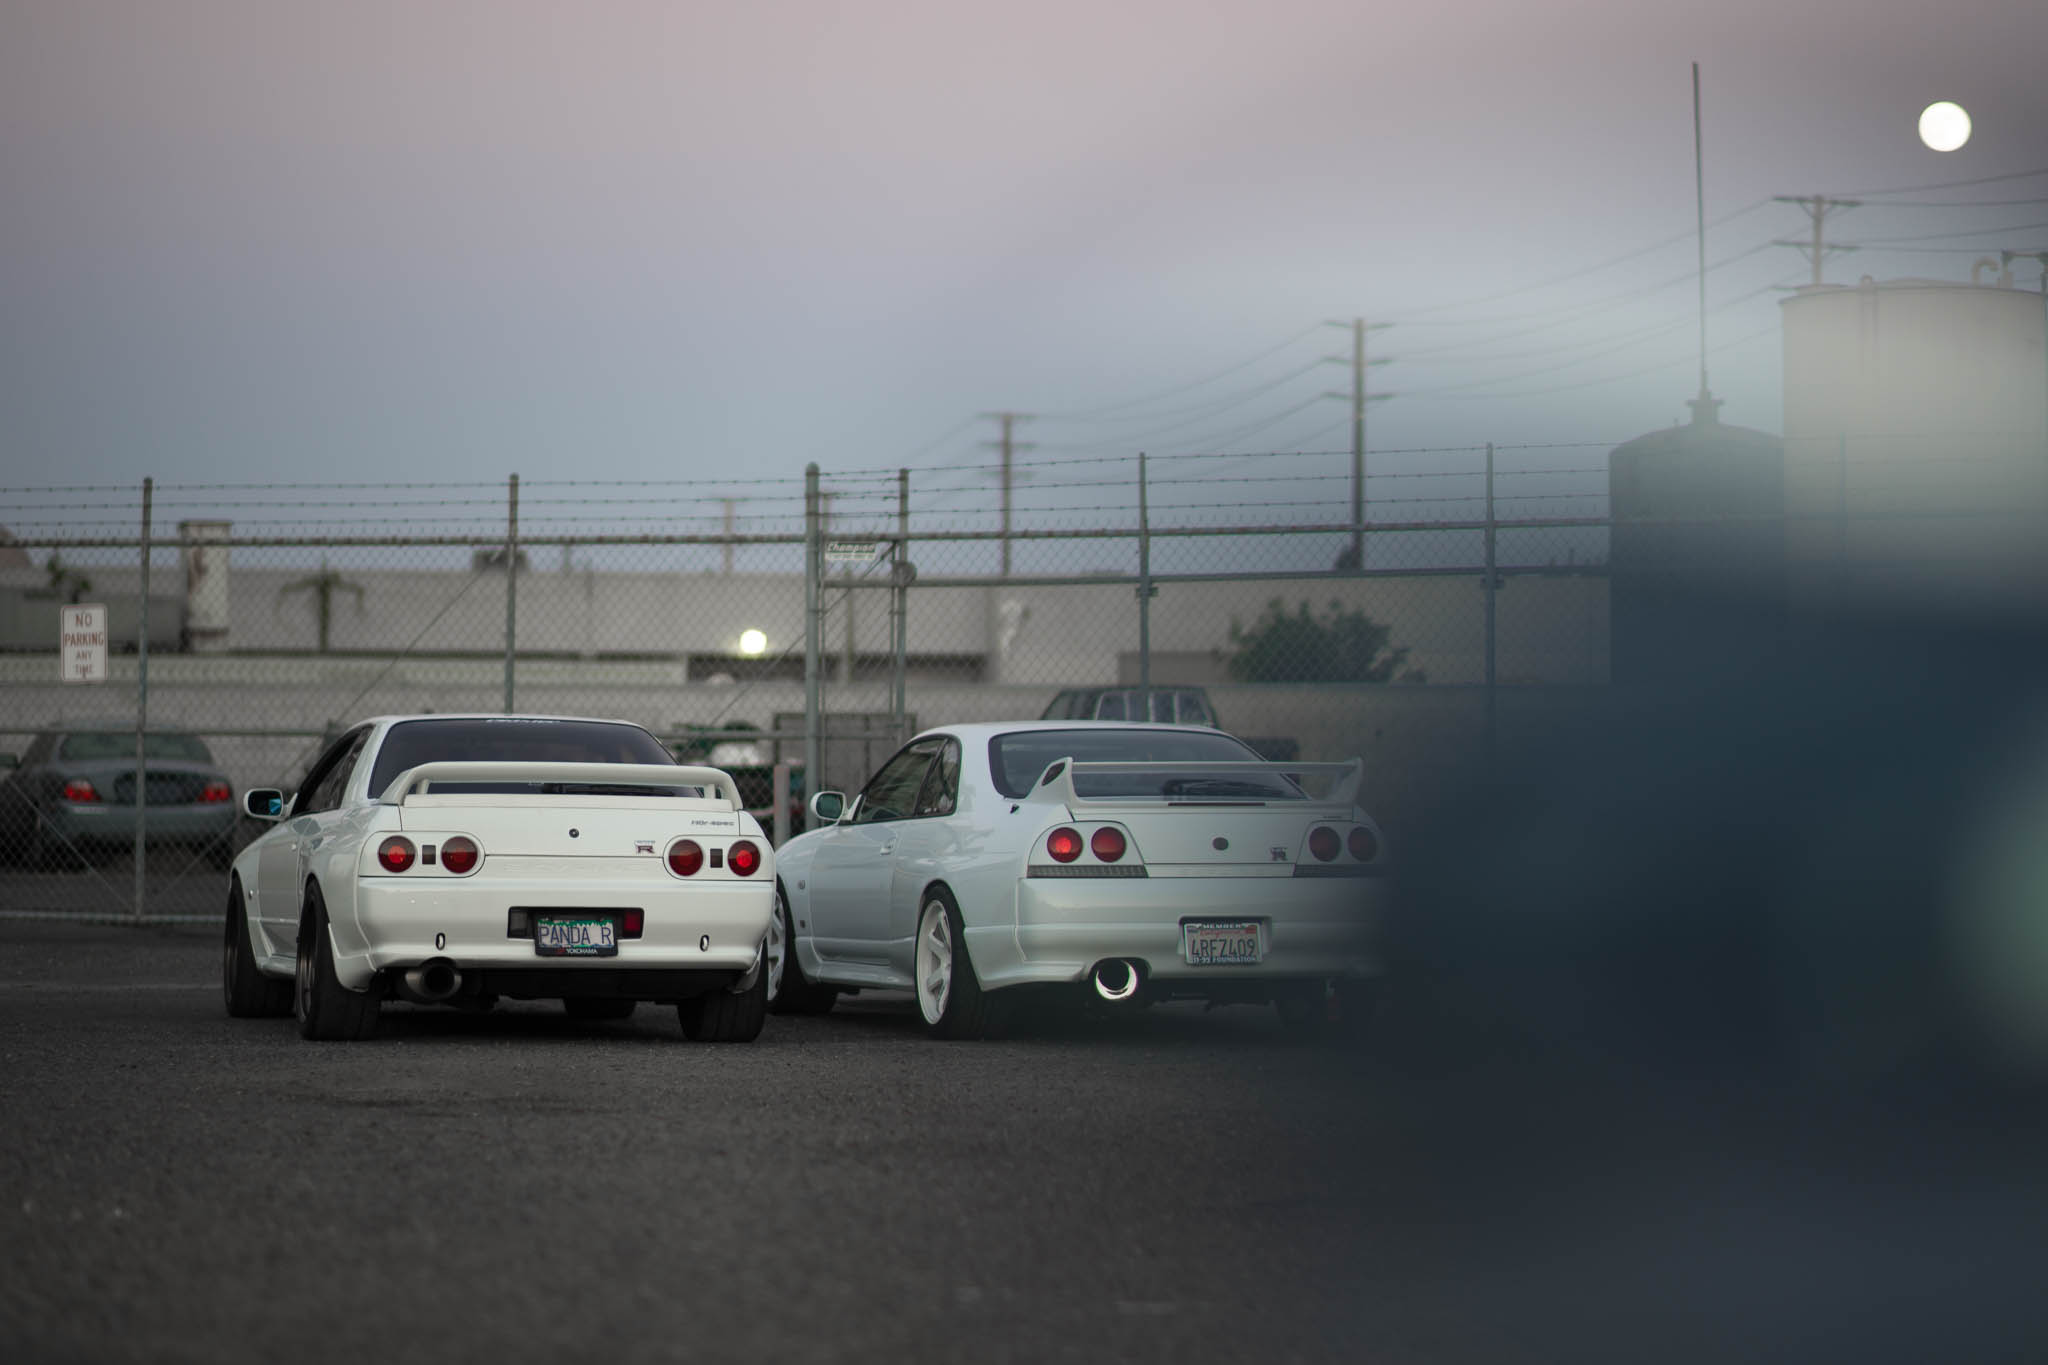 Stay_Driven_Skyline_Syndicate_T_C-49.jpg